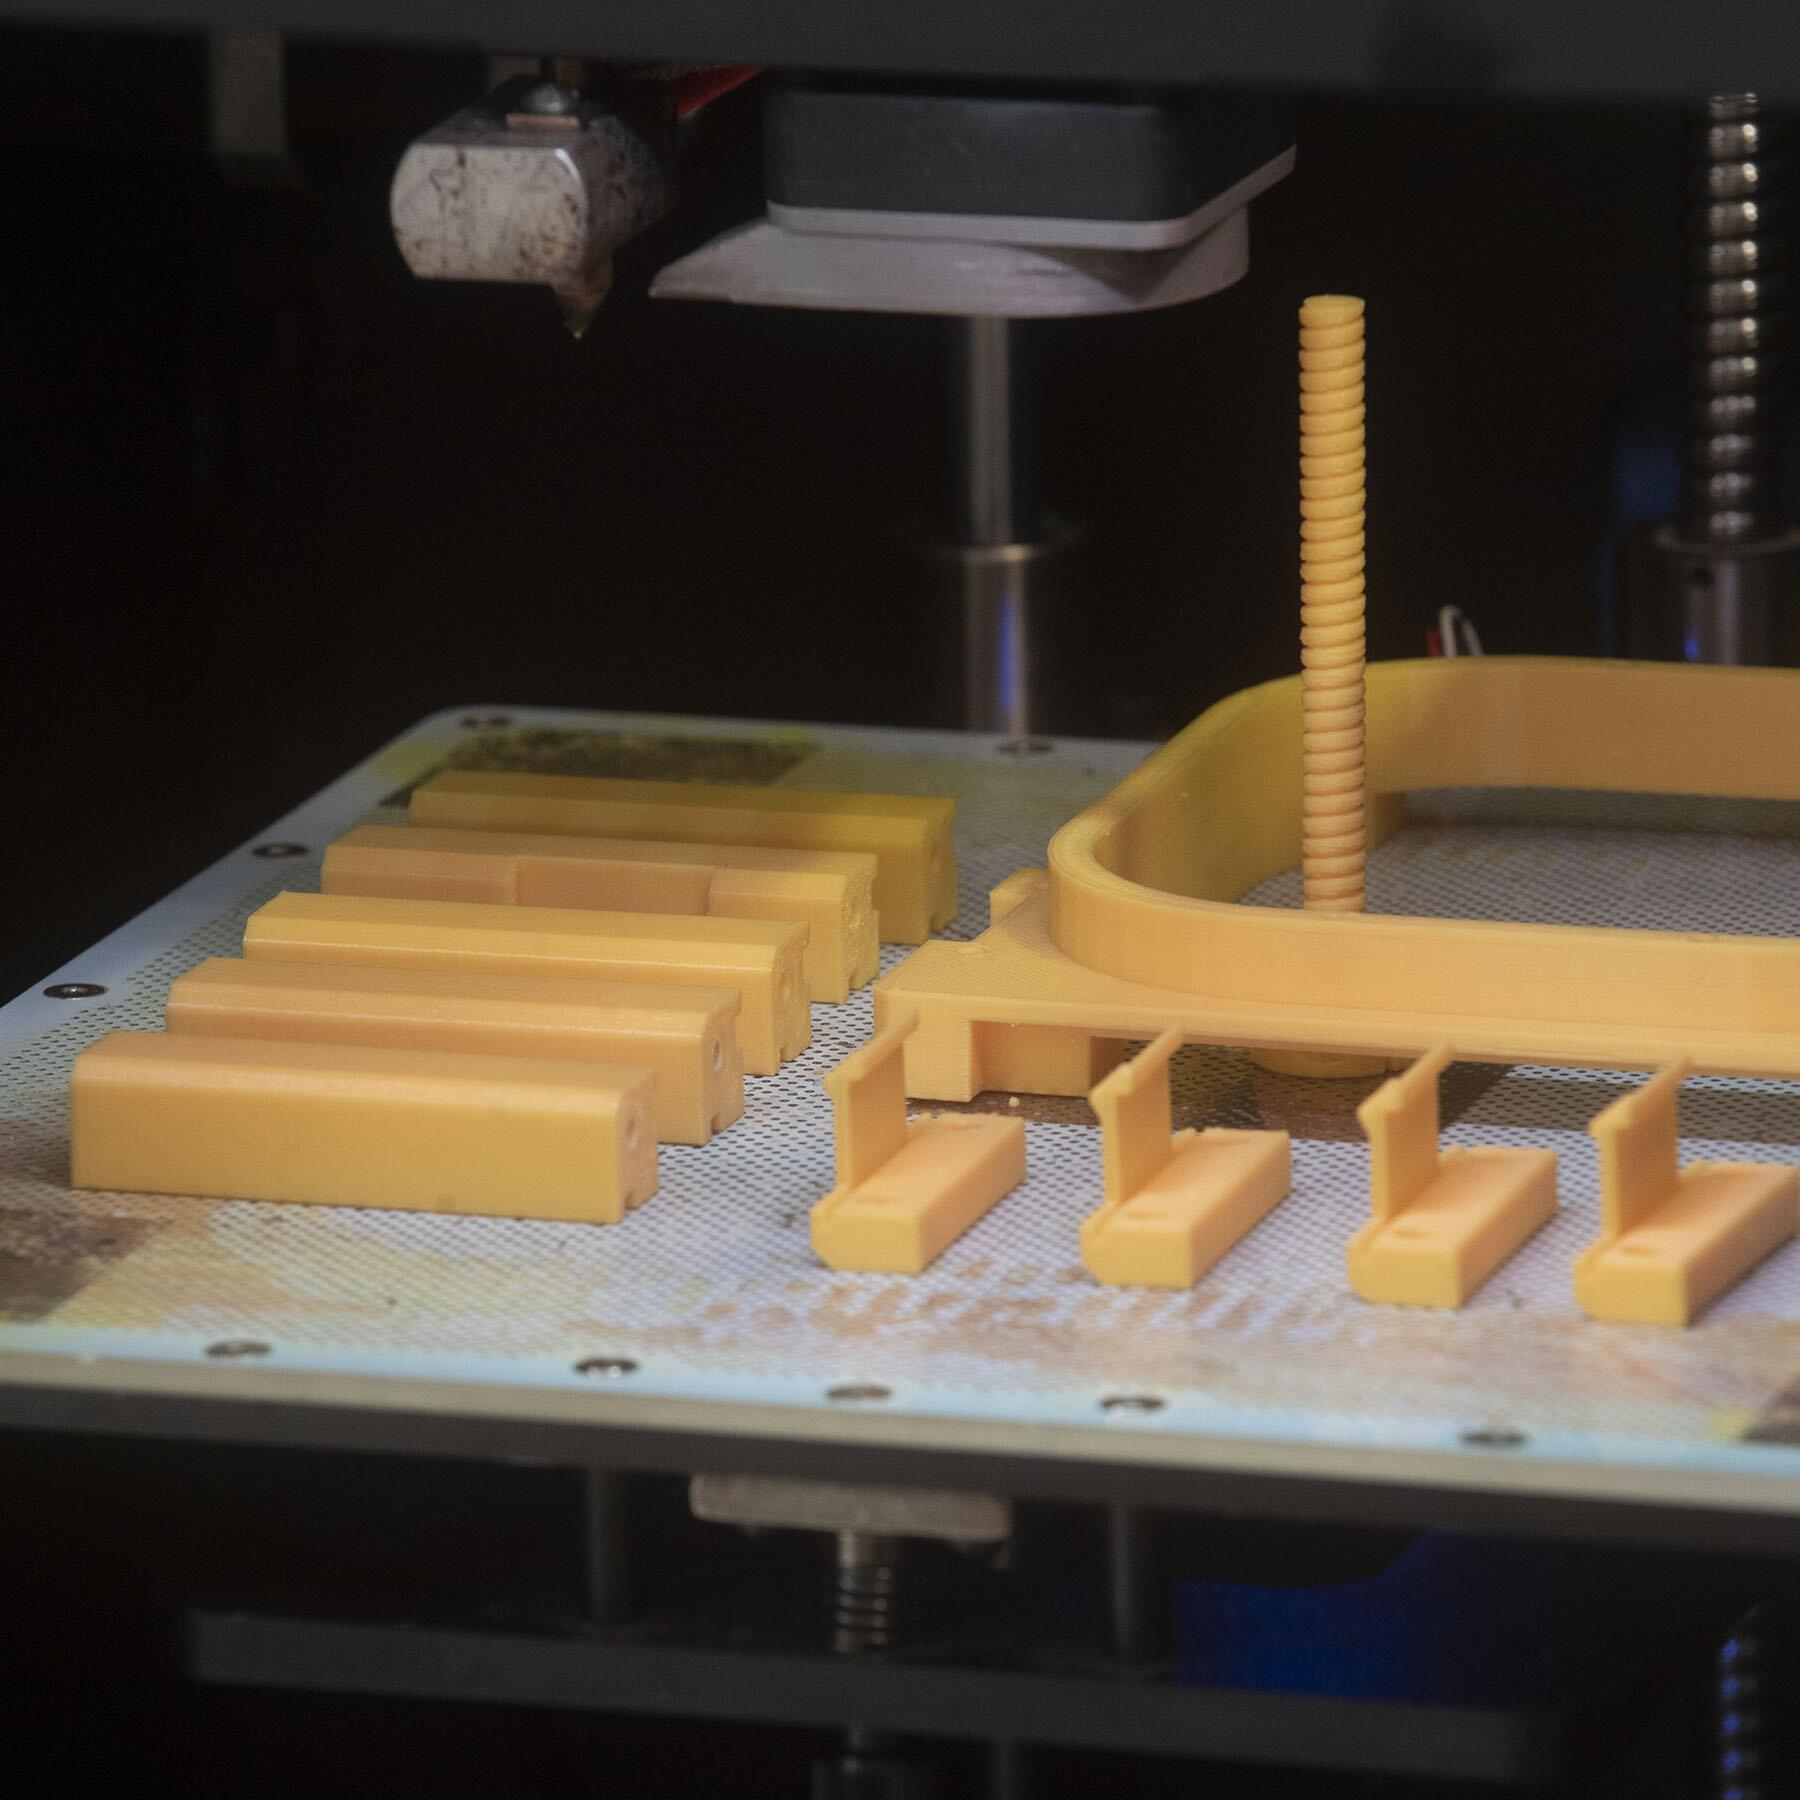 3D printing a 3D printer